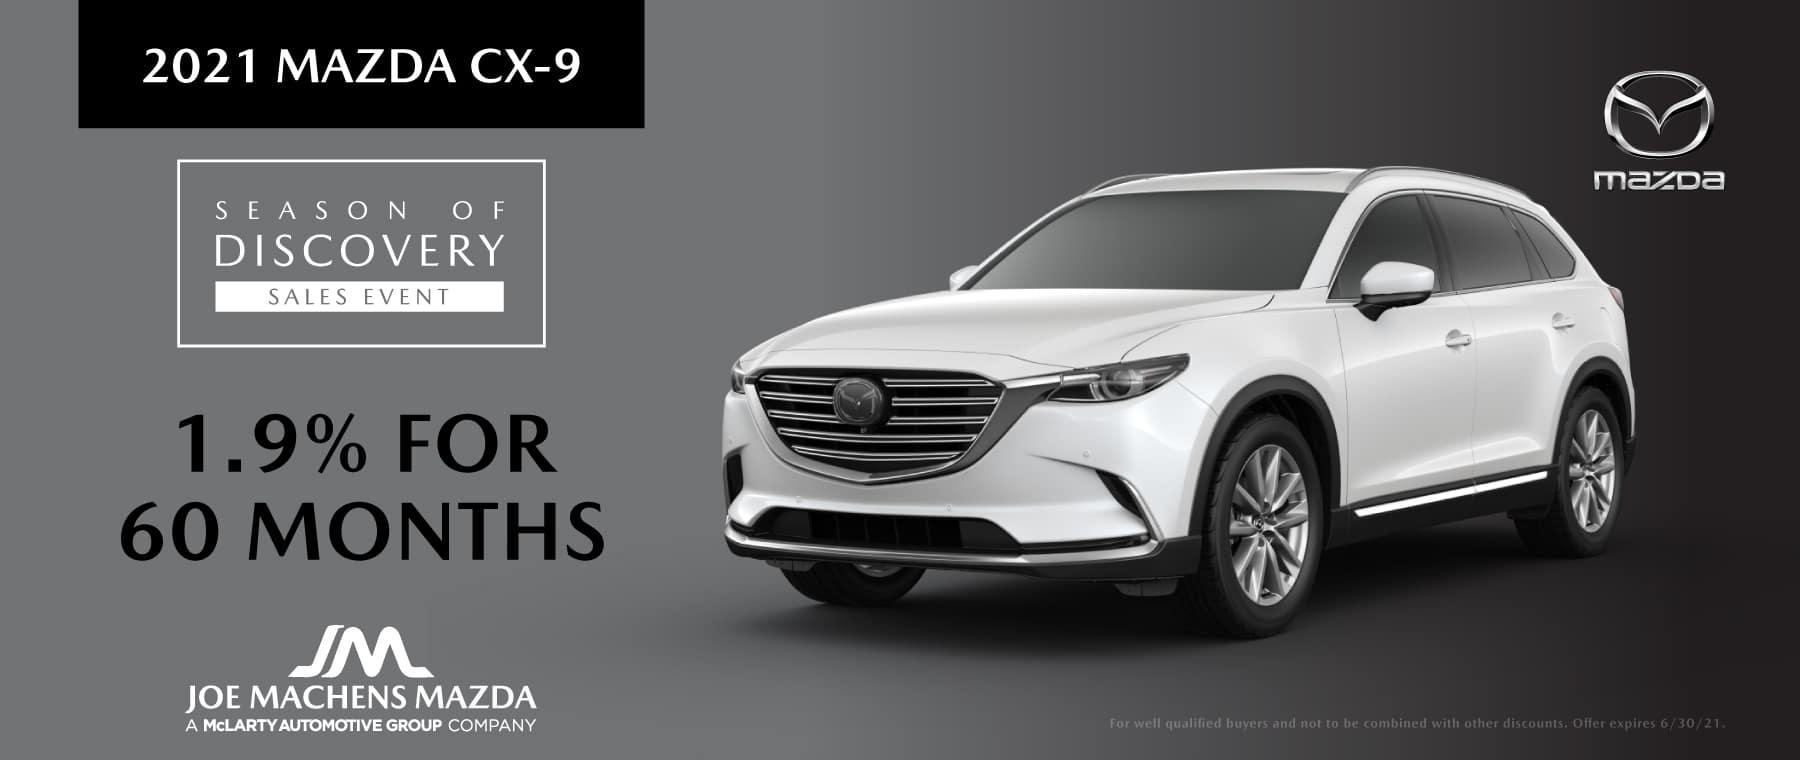 Machens-Mazda-Incentives-06-21_Slider-Mazda-CX9